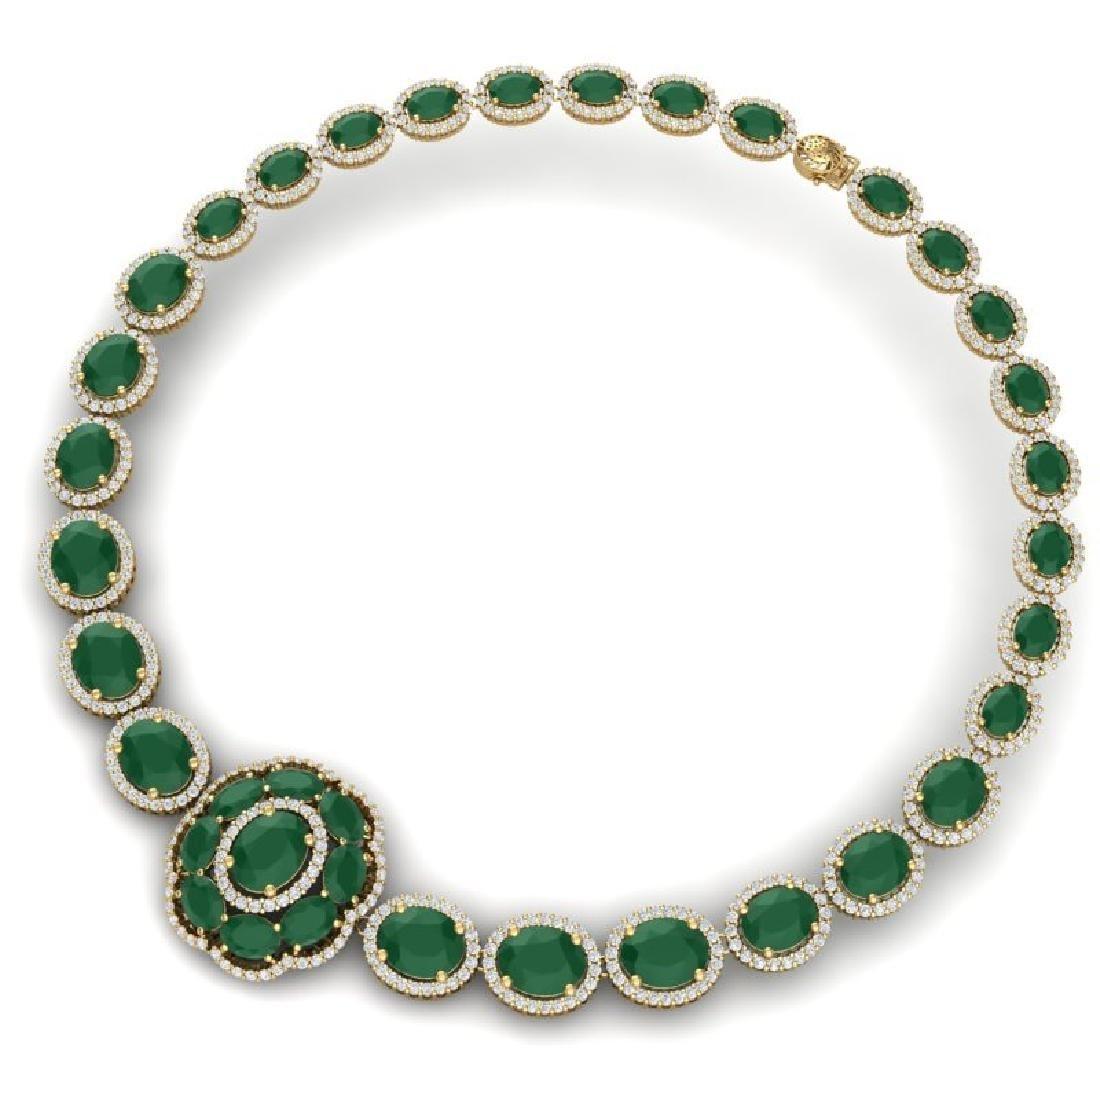 58.33 CTW Royalty Emerald & VS Diamond Necklace 18K - 3